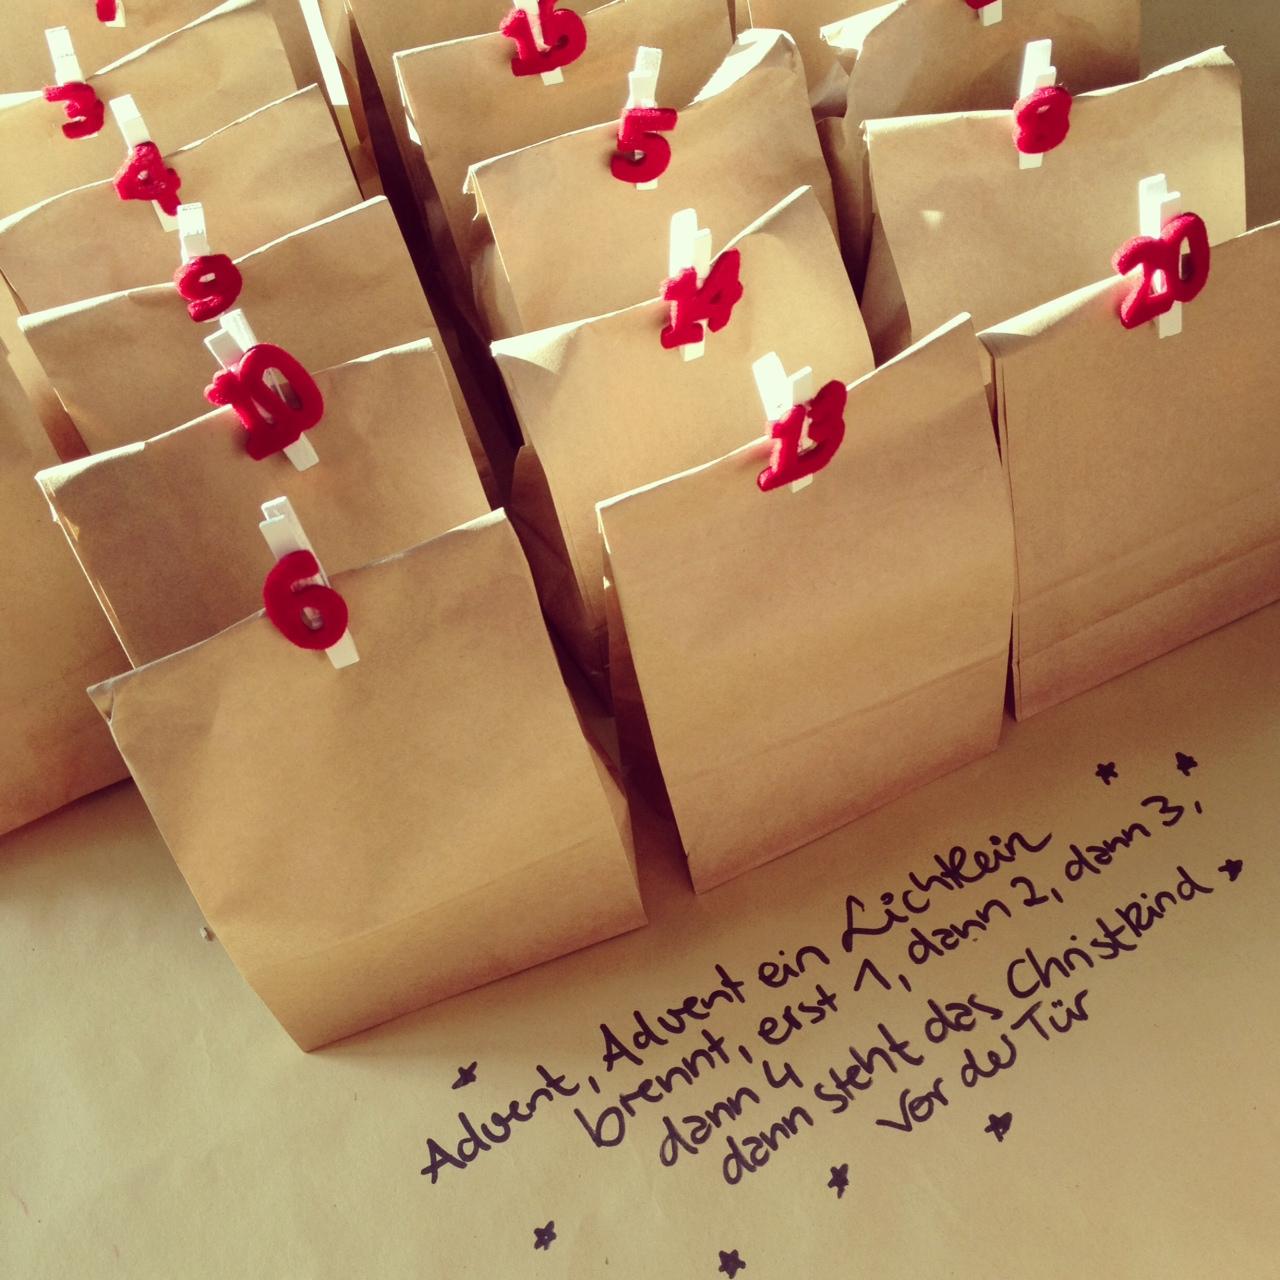 Geschenk Beste Freundin Selbstgemacht #RL92 | Startupjobsfa